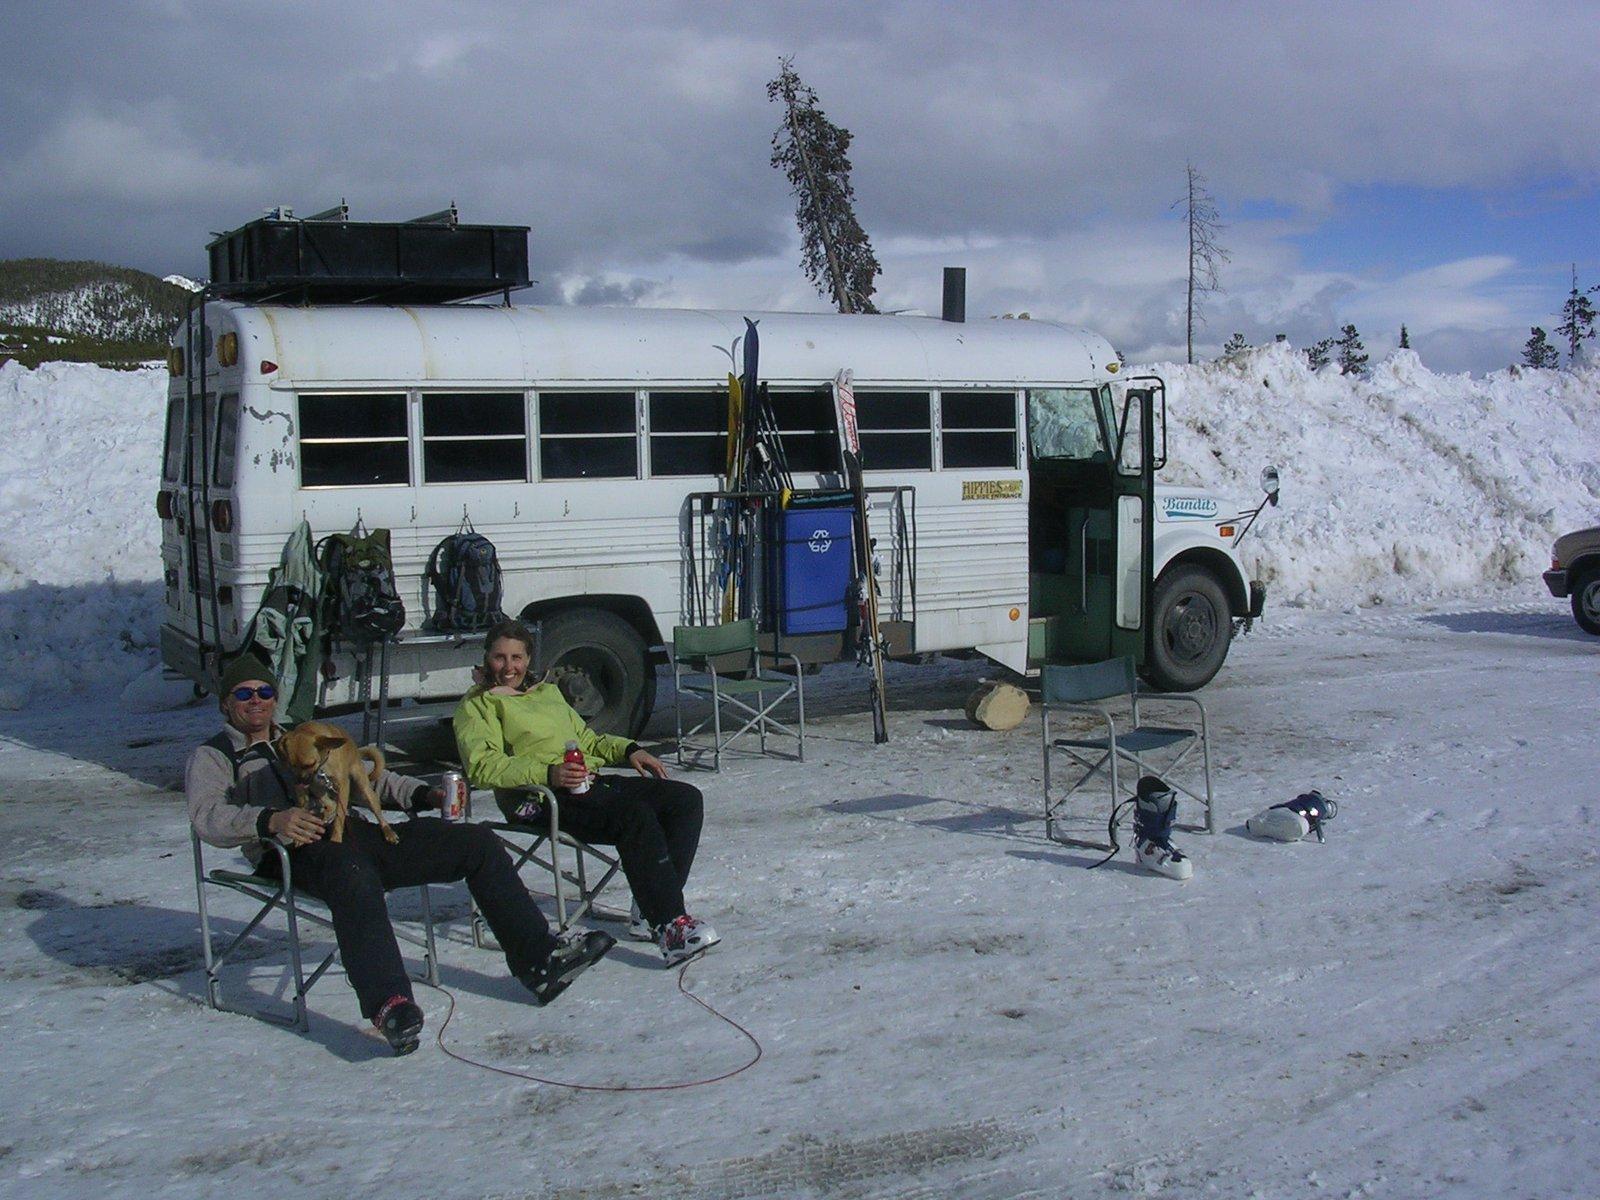 The Powder Bandit Bus